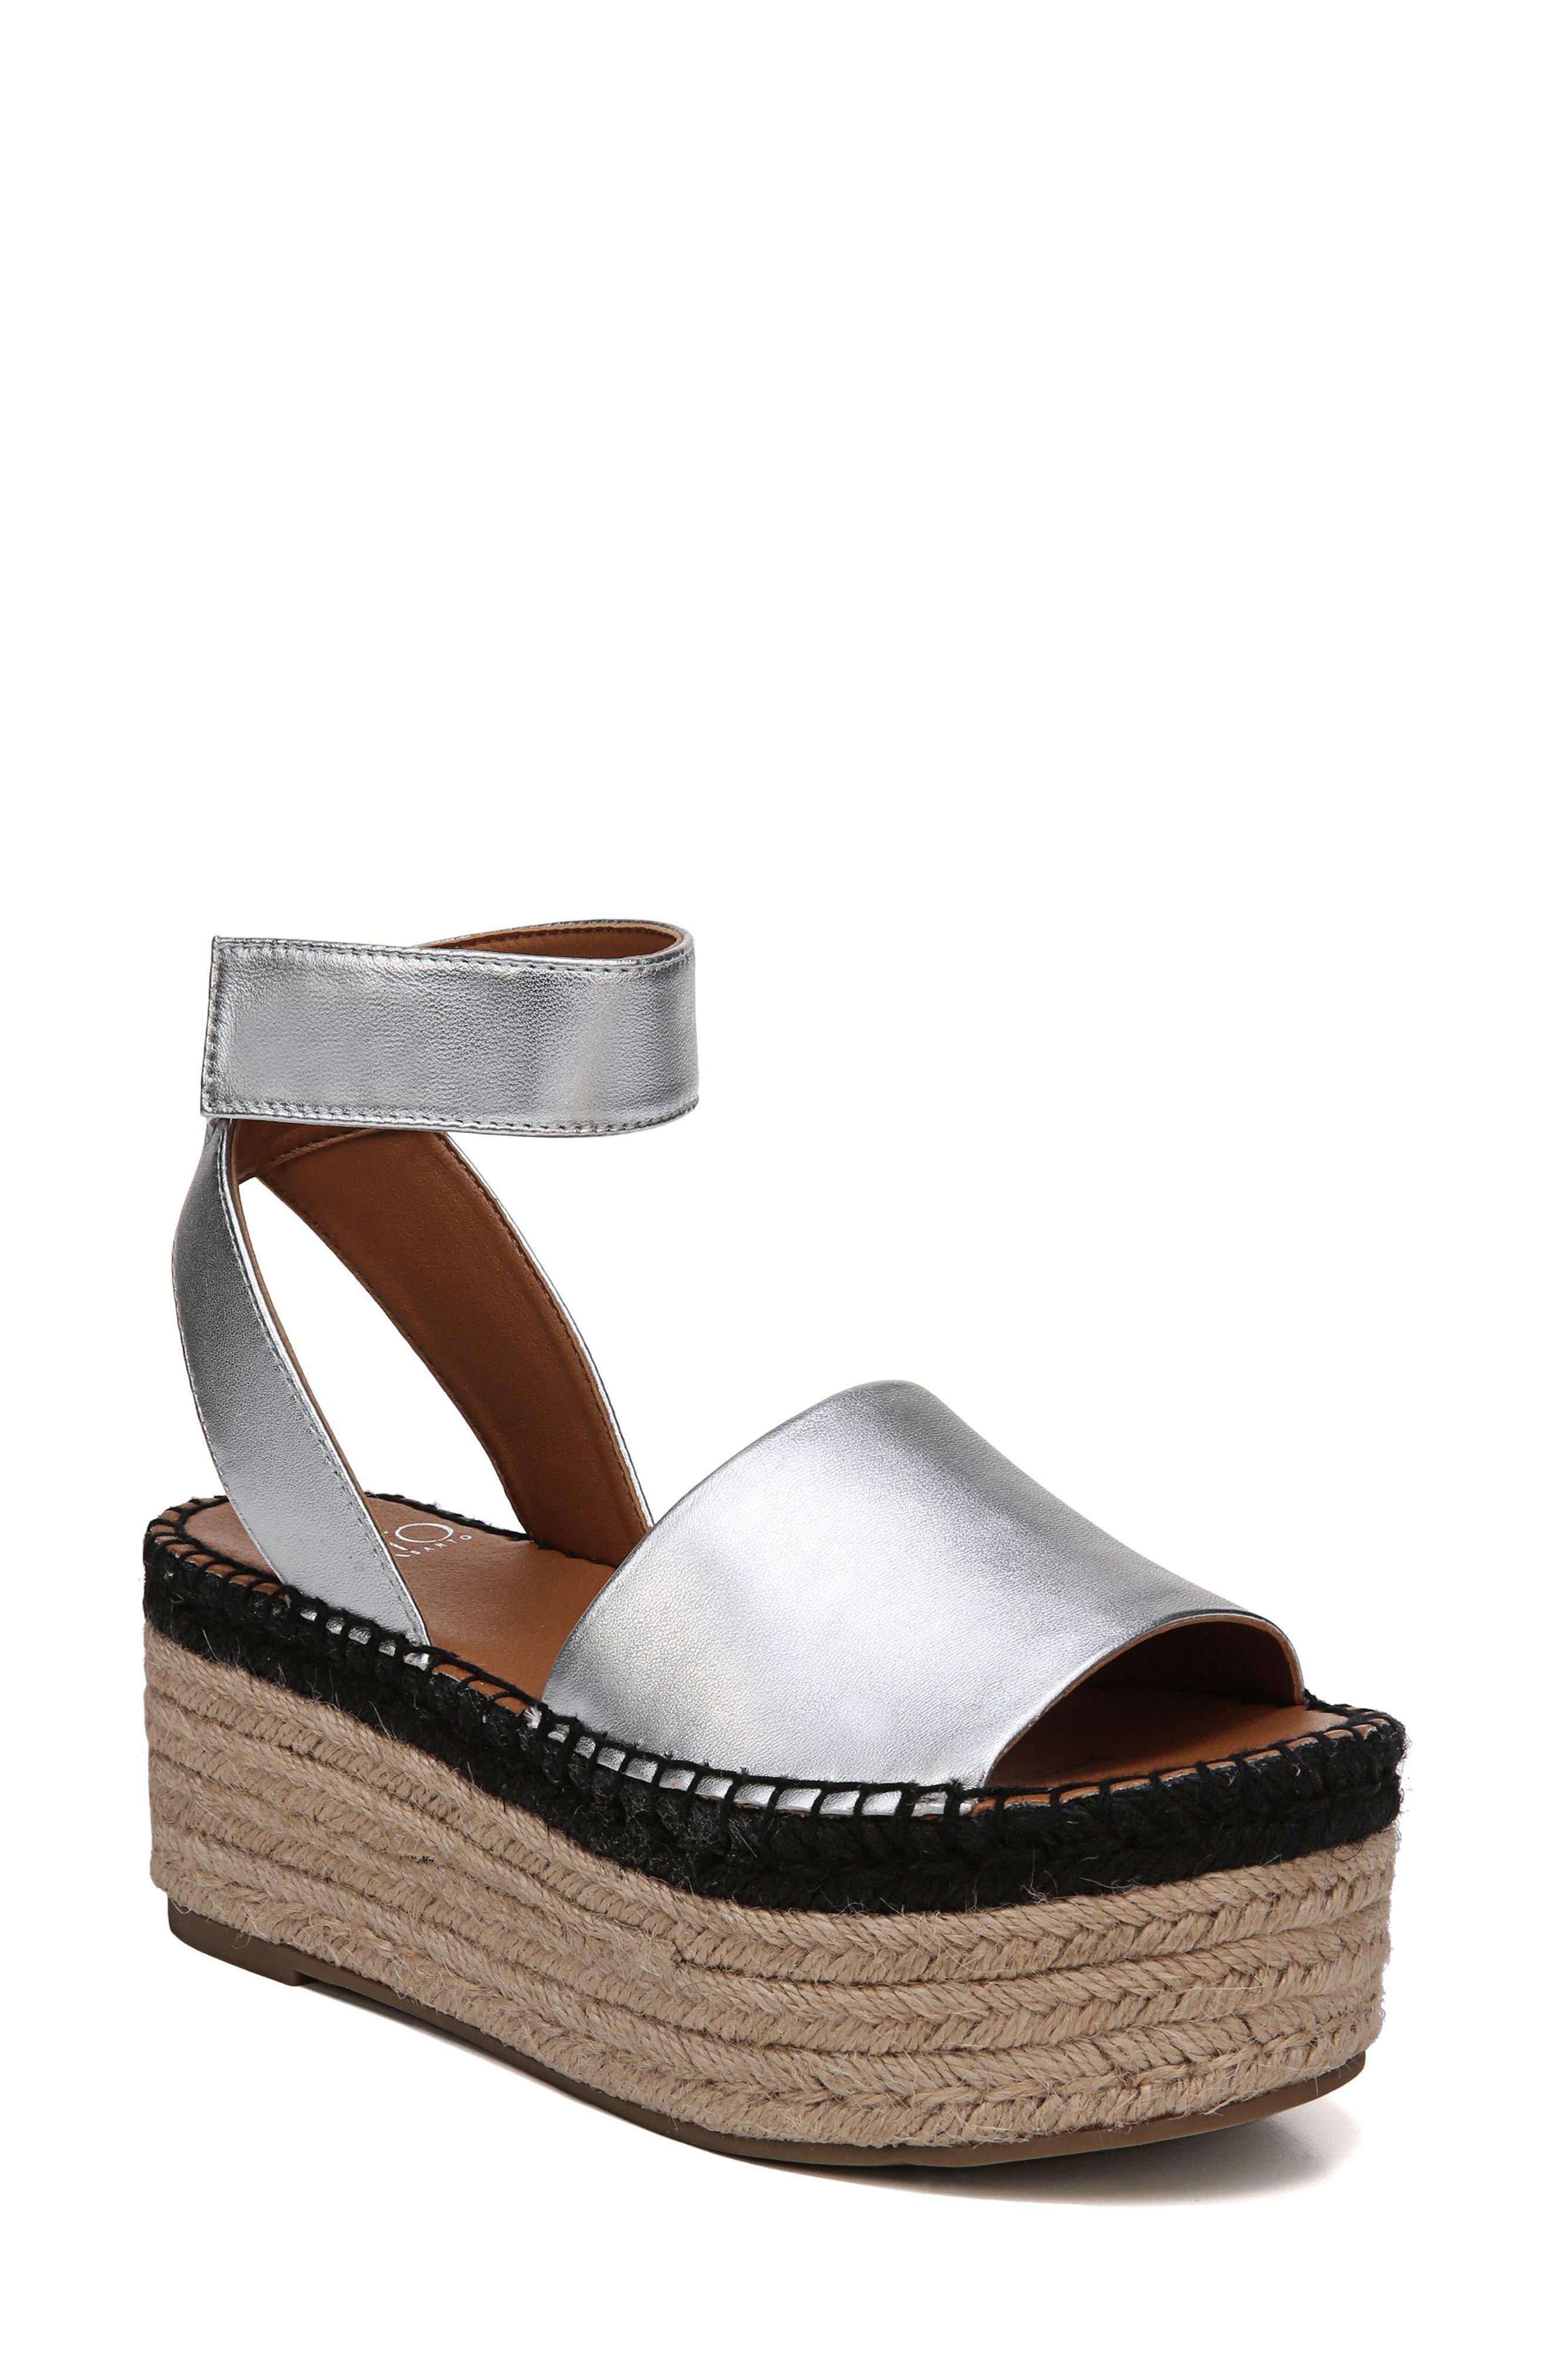 Maisi Platform Espadrille Sandal,                         Main,                         color, Silver Leather